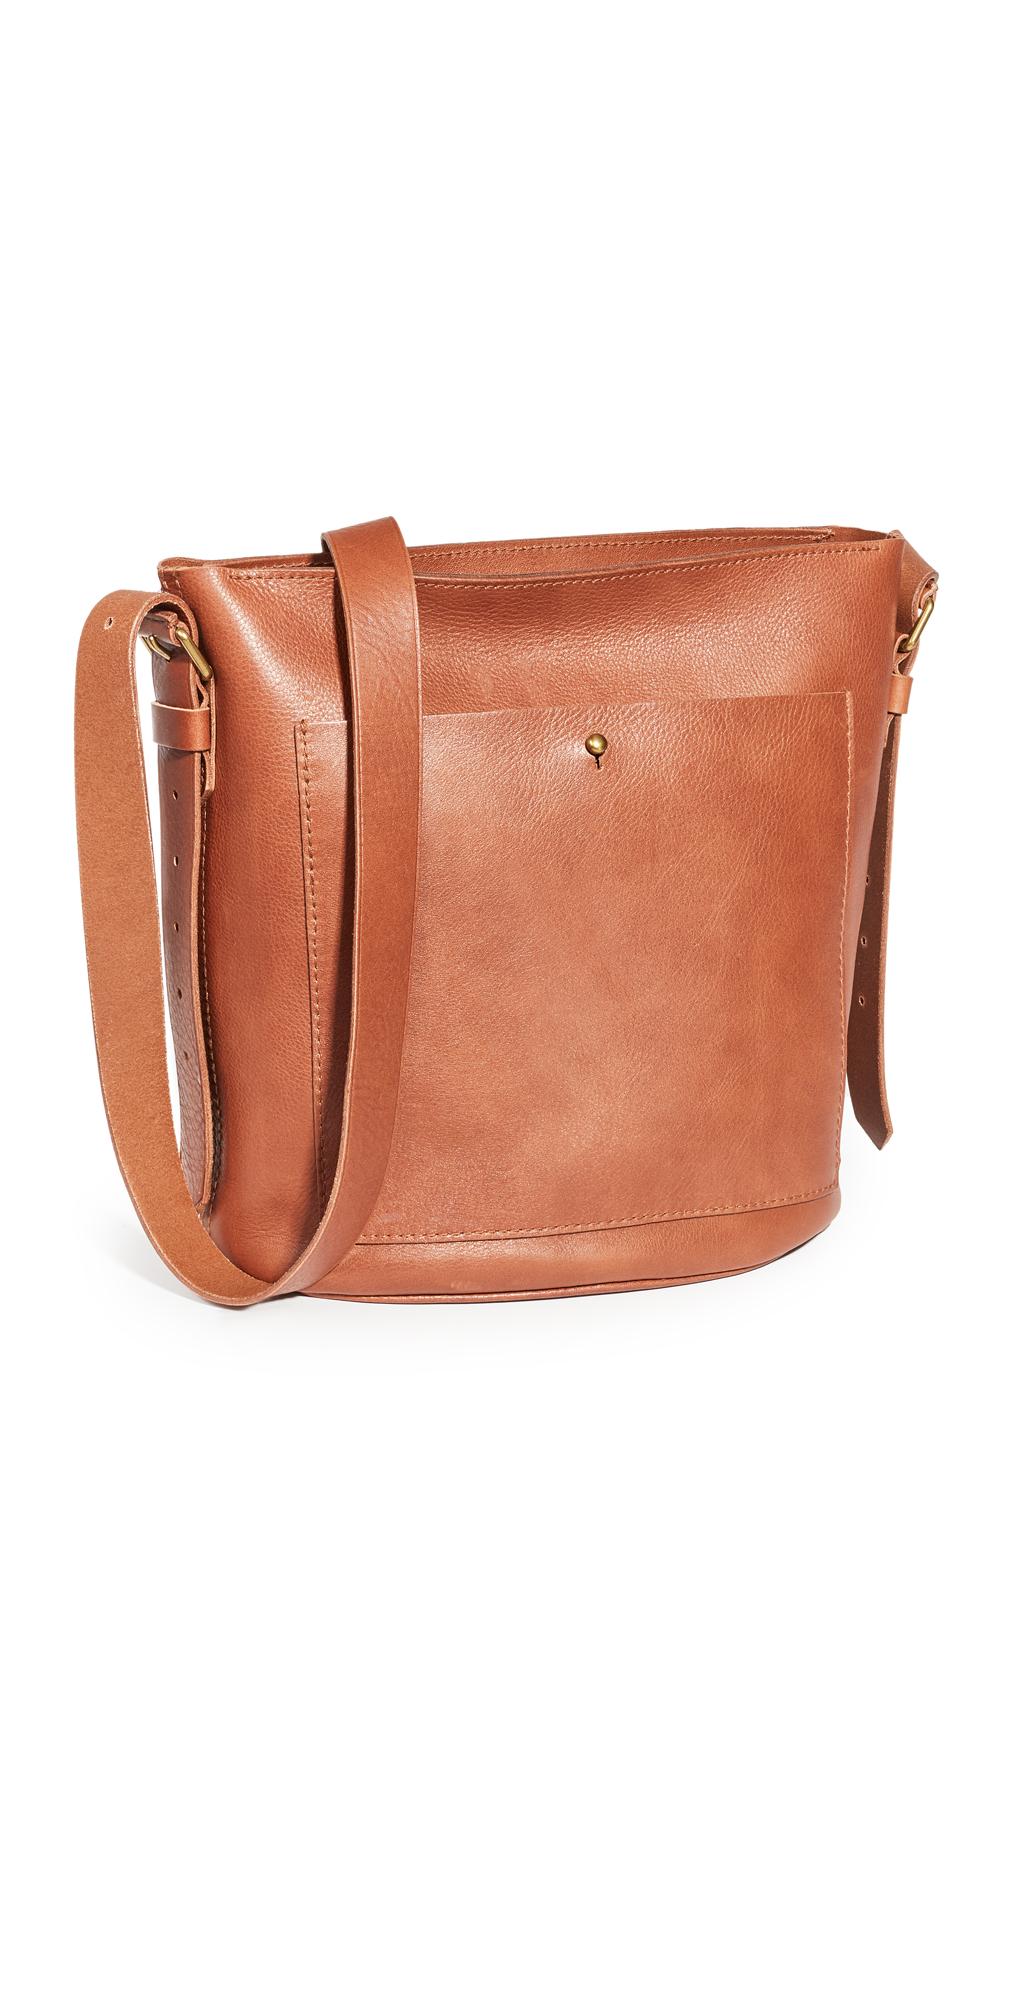 Madewell Transport Bucket Bag